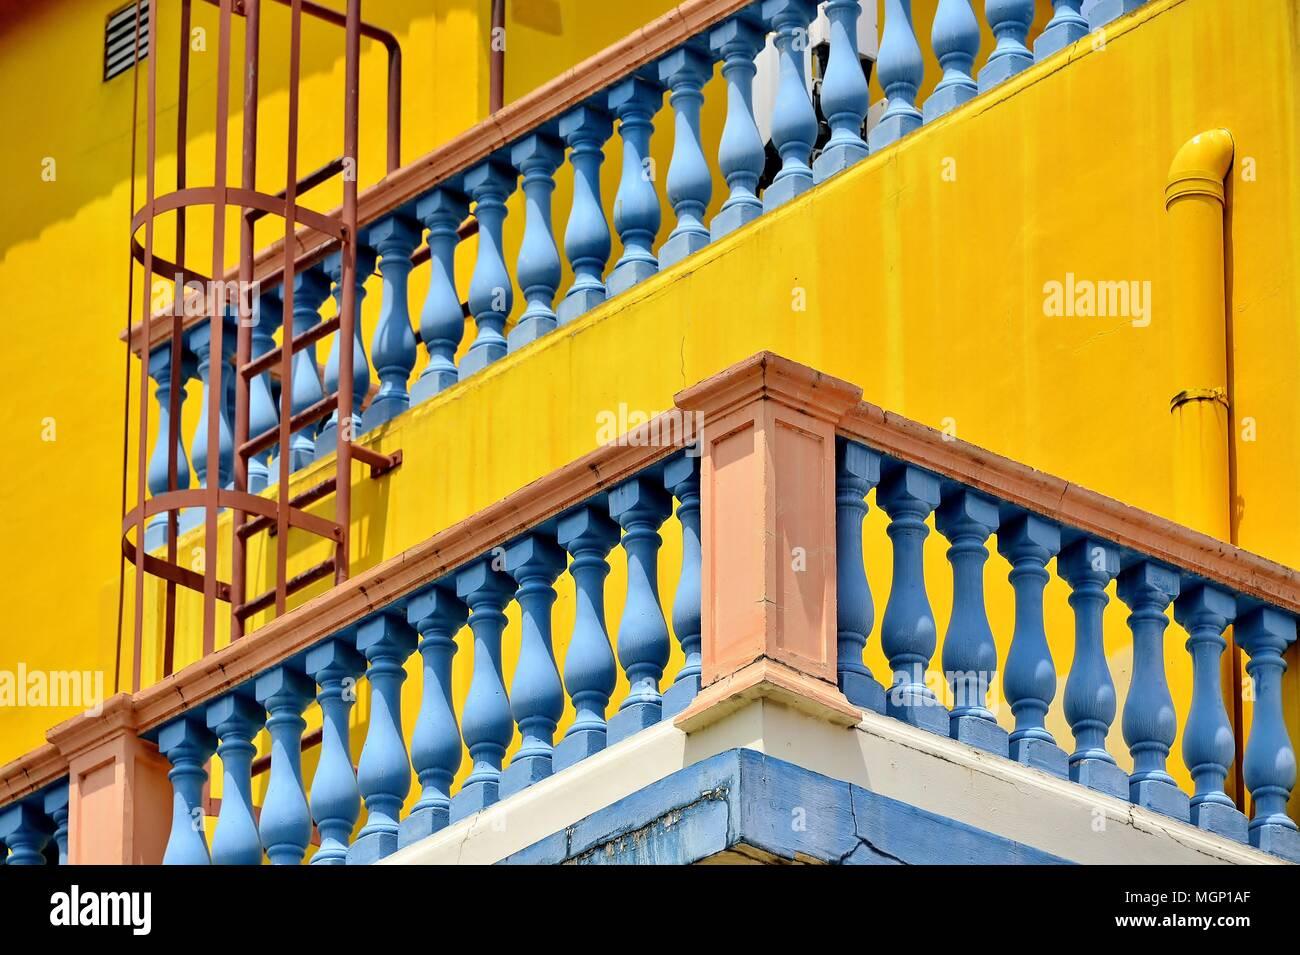 Singapore Endingen balcony detail railings stock photos balcony detail railings stock